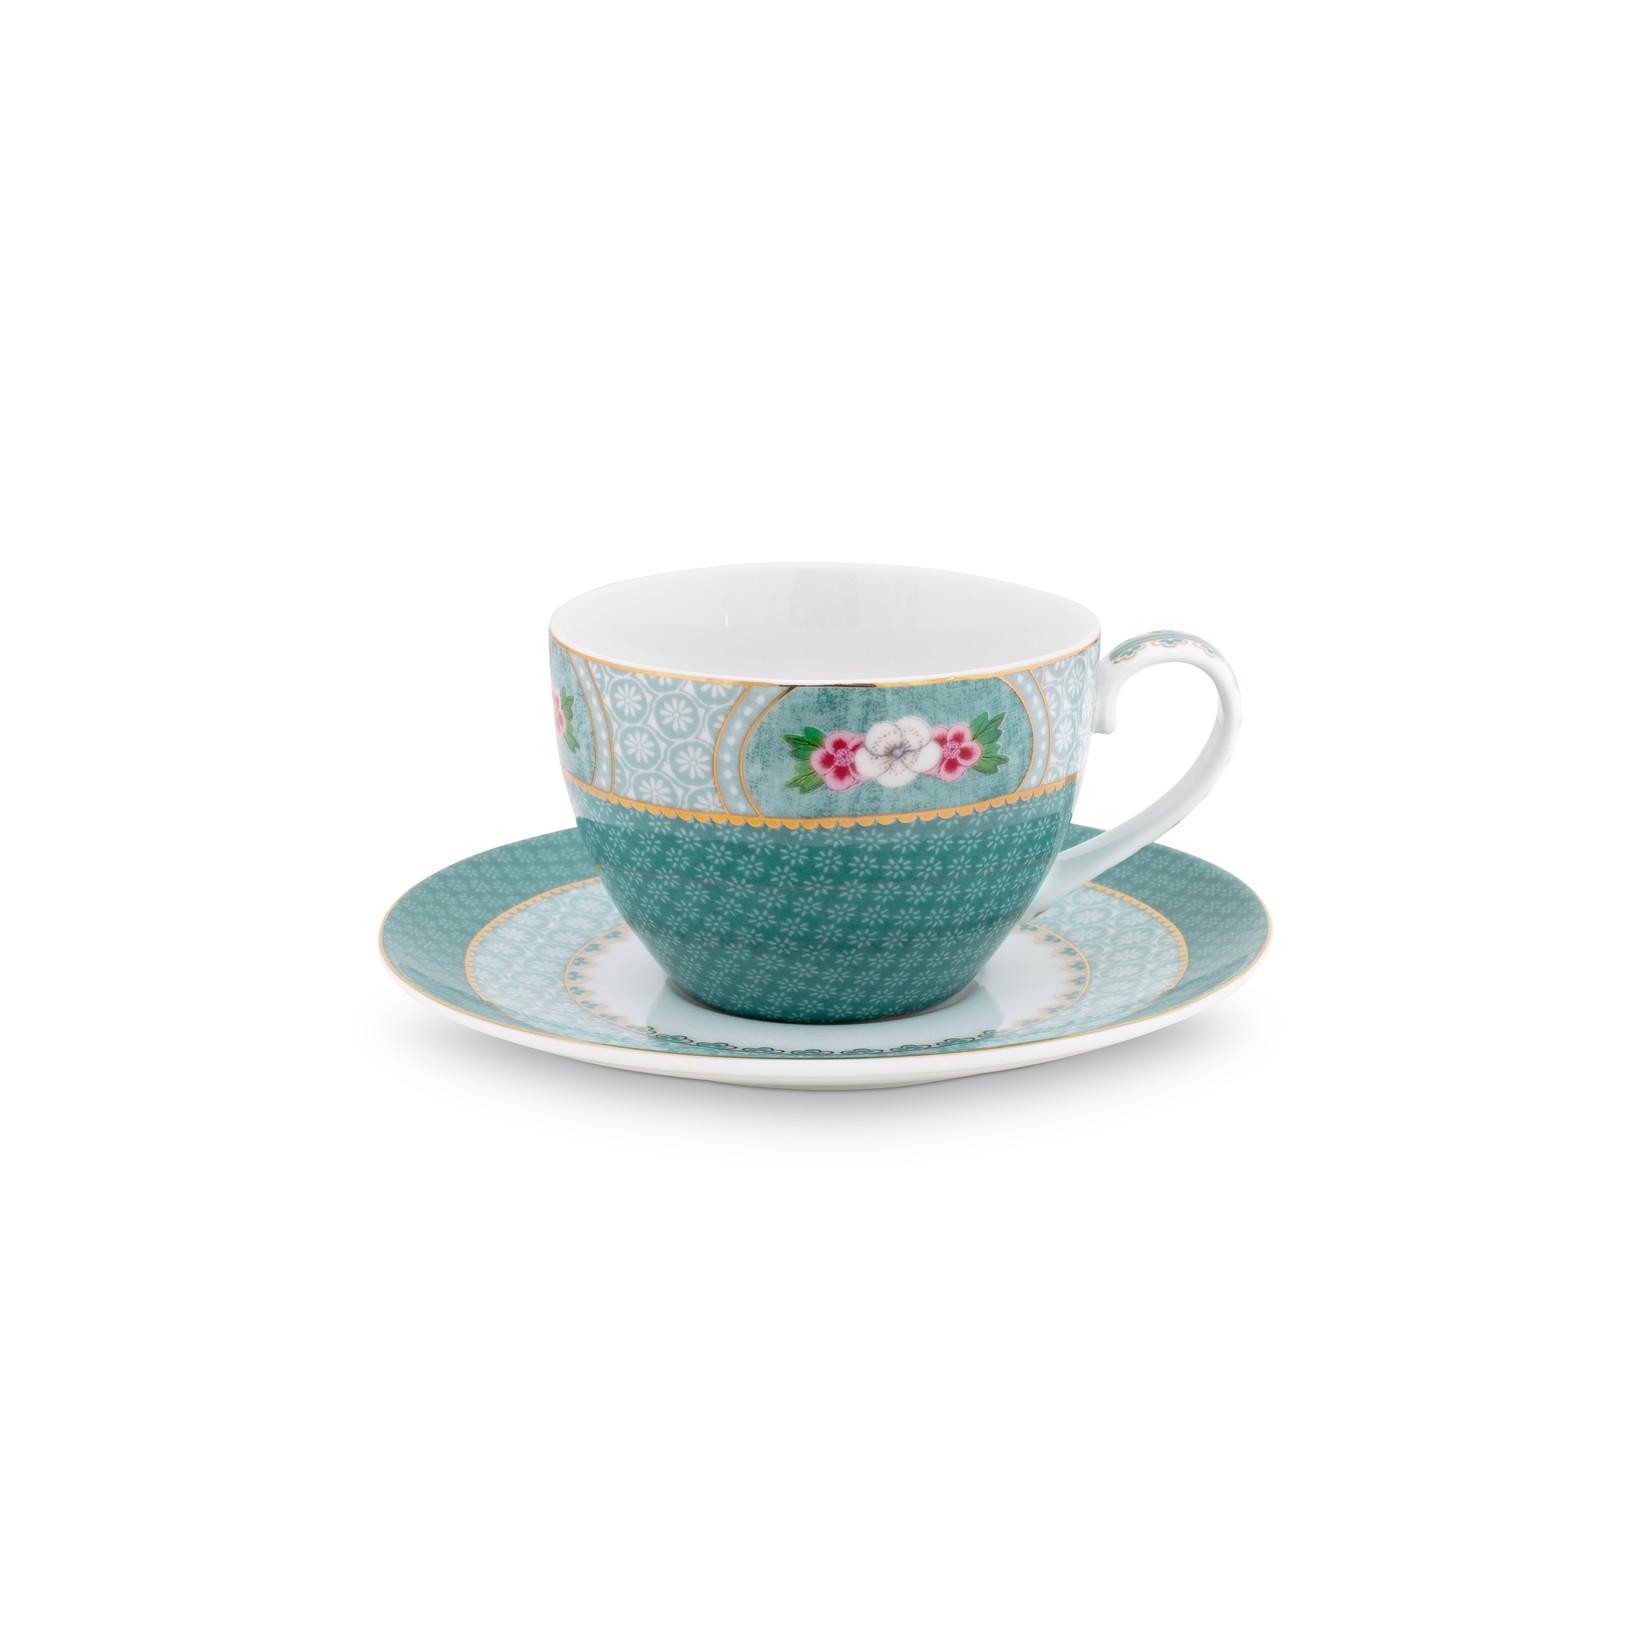 PIP Studio Cup & Saucer Blushing Birds Blue 280ml